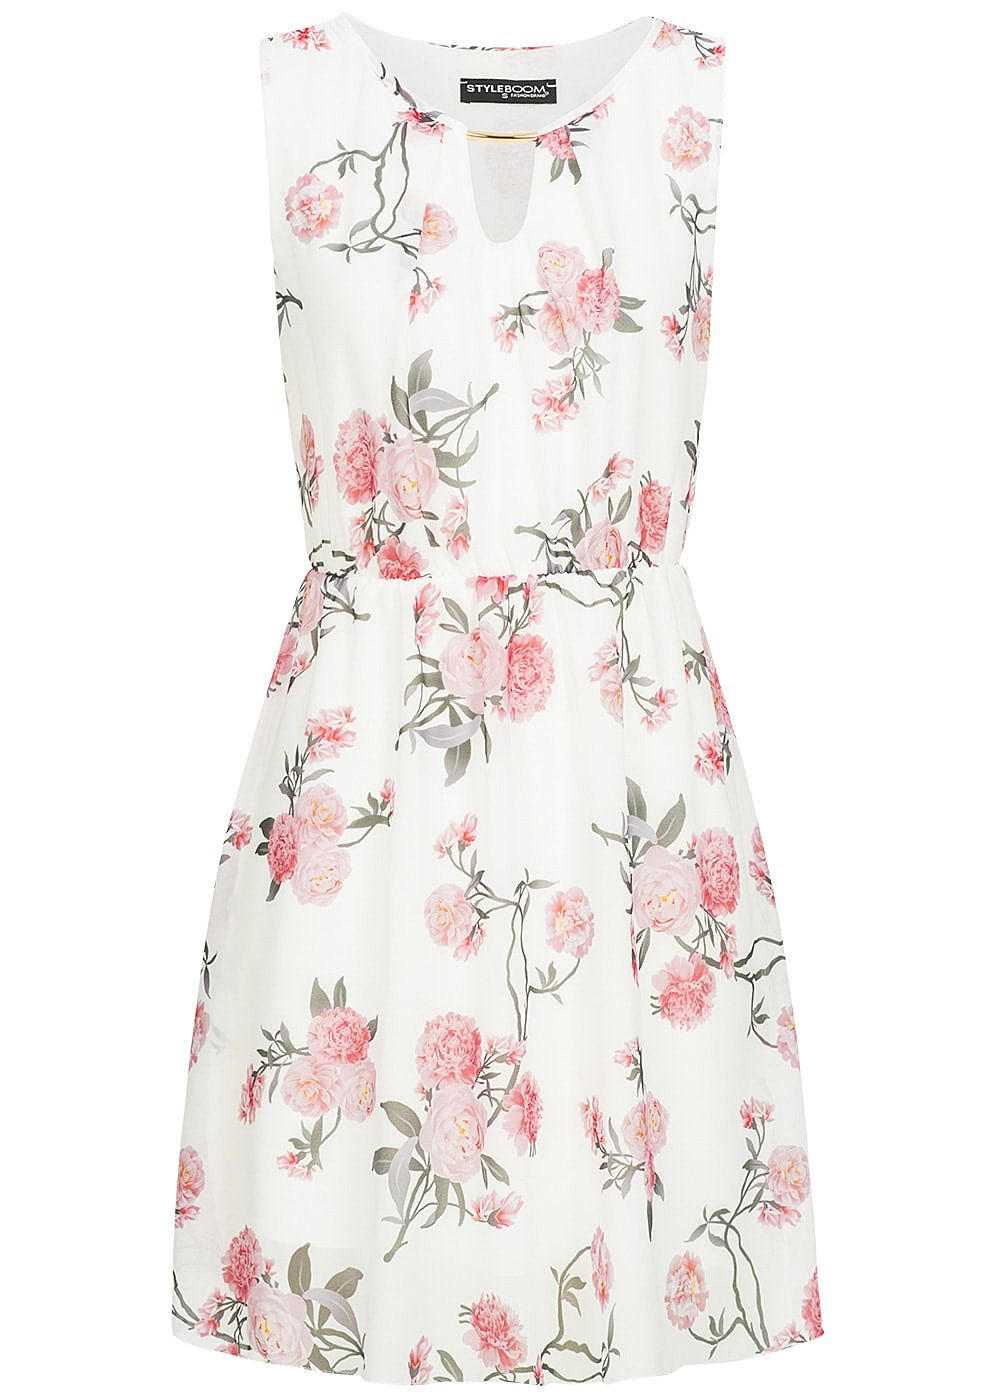 9d1391f95a4 Styleboom Fashion Damen Kleid Blumen Muster Röhren Ornament 2-lagig ...